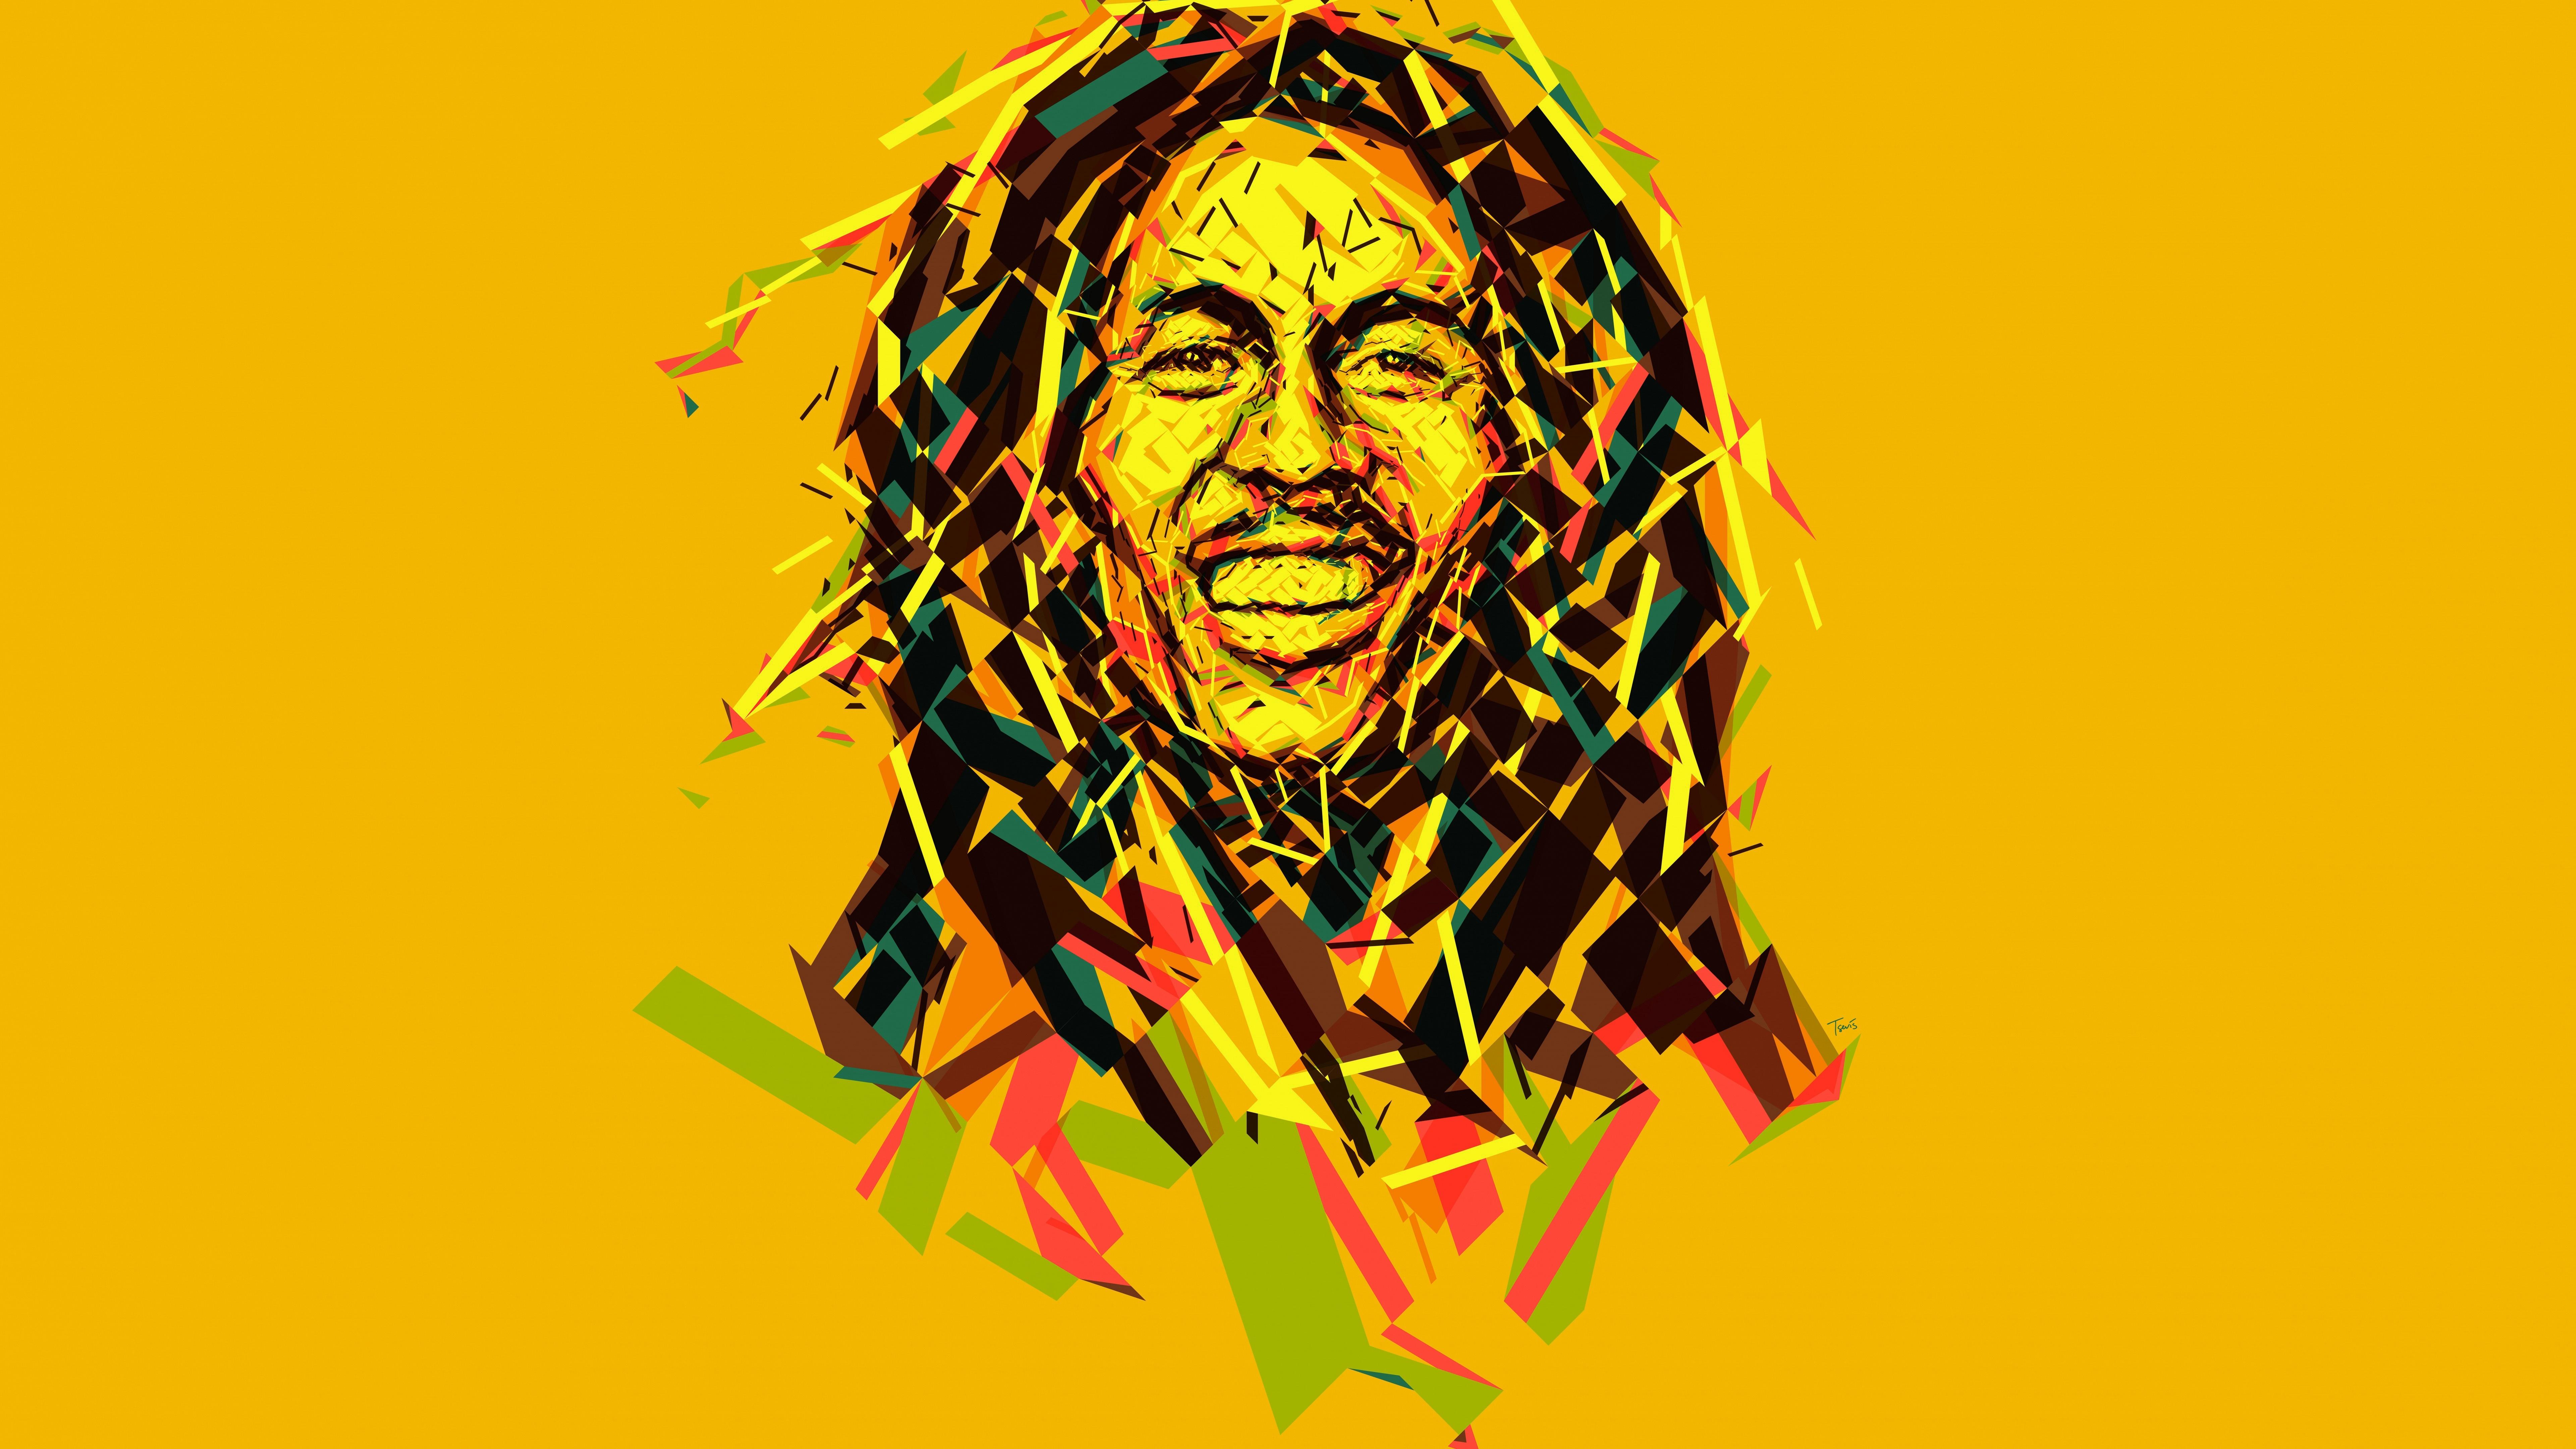 Ganja Wallpaper 3d 7680x4320 Bob Marley Abstract Artwork 8k 8k Hd 4k